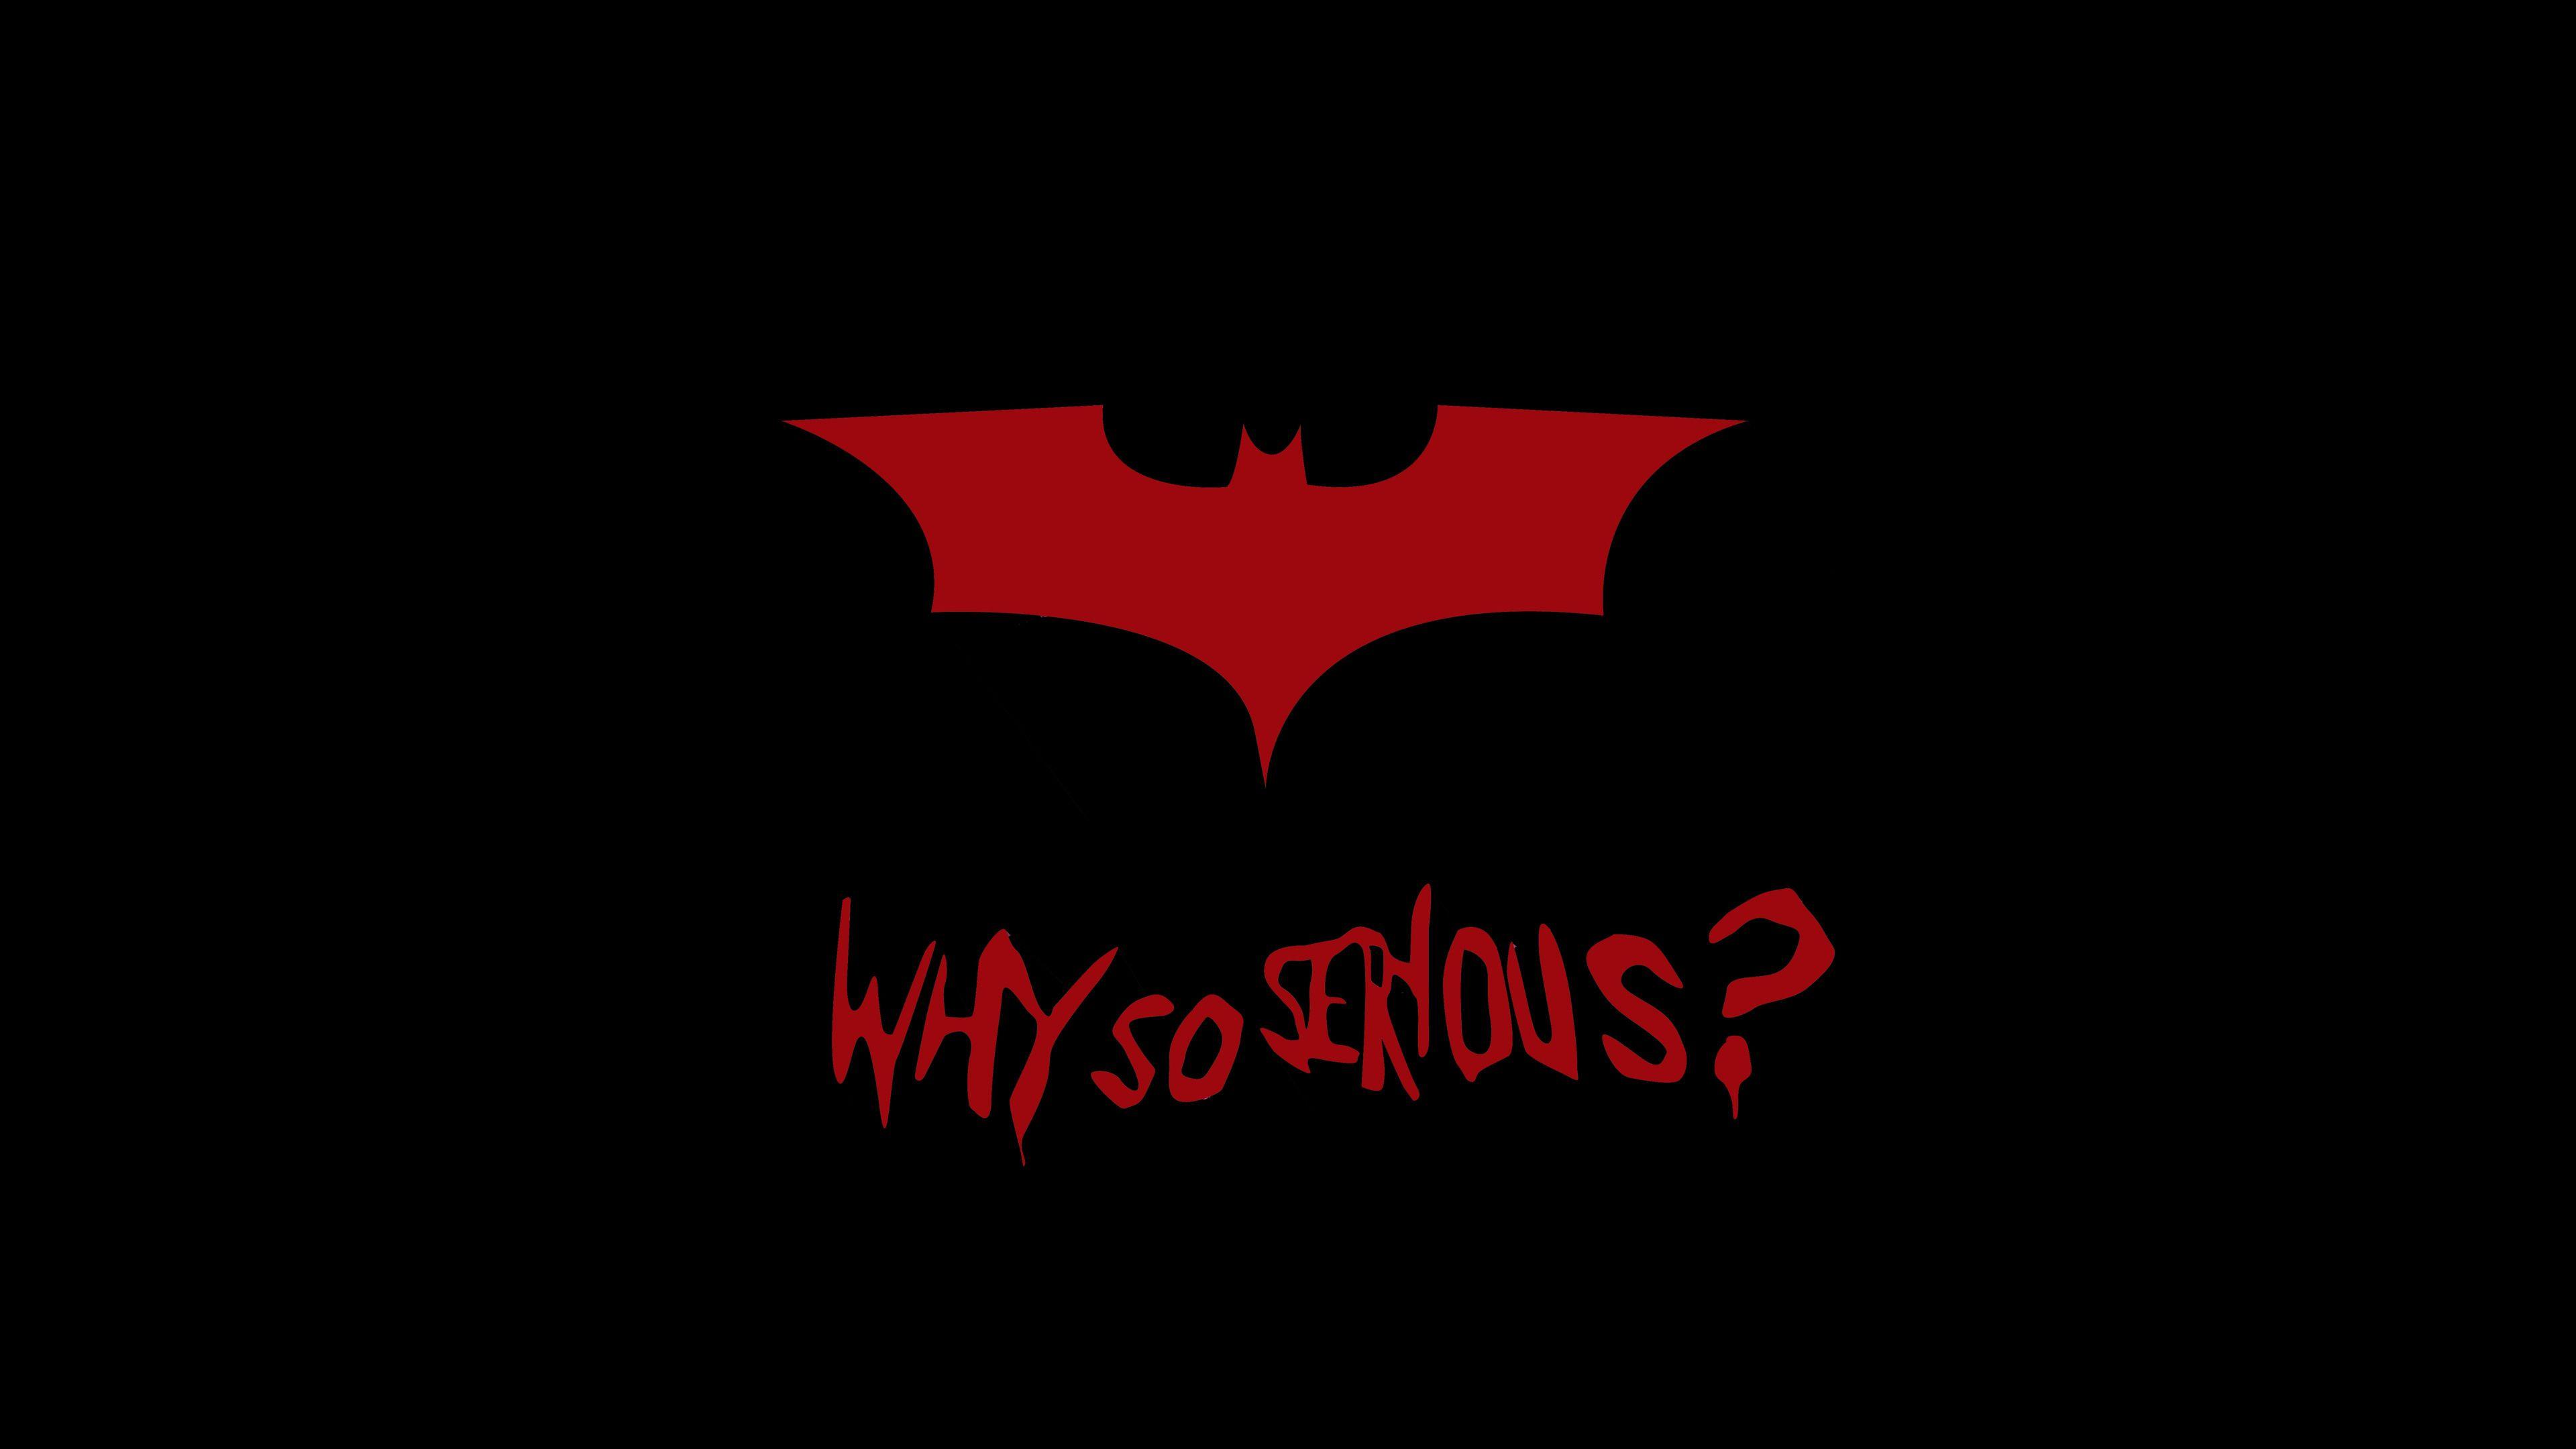 Batman Logo 8k Logo Wallpapers Hd Wallpapers Batman Wallpapers 8k Wallpapers 5k Wallpapers 4k Wallpap Batman Wallpaper Joker Hd Wallpaper Joker Wallpapers